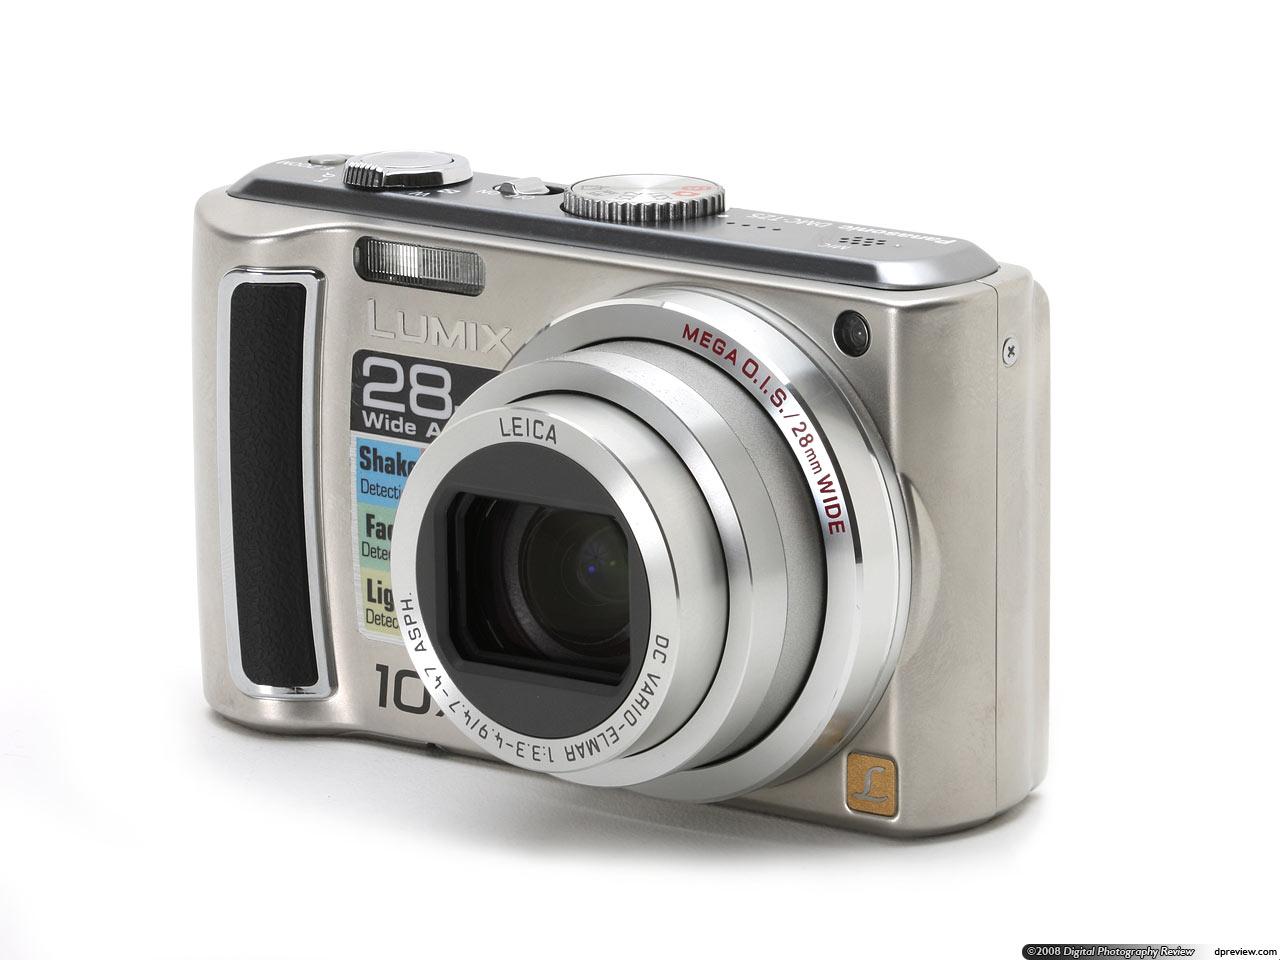 panasonic lumix dmc tz5 concise review digital photography review rh dpreview com panasonic dmc tz5 notice panasonic dmc tz 55 manual